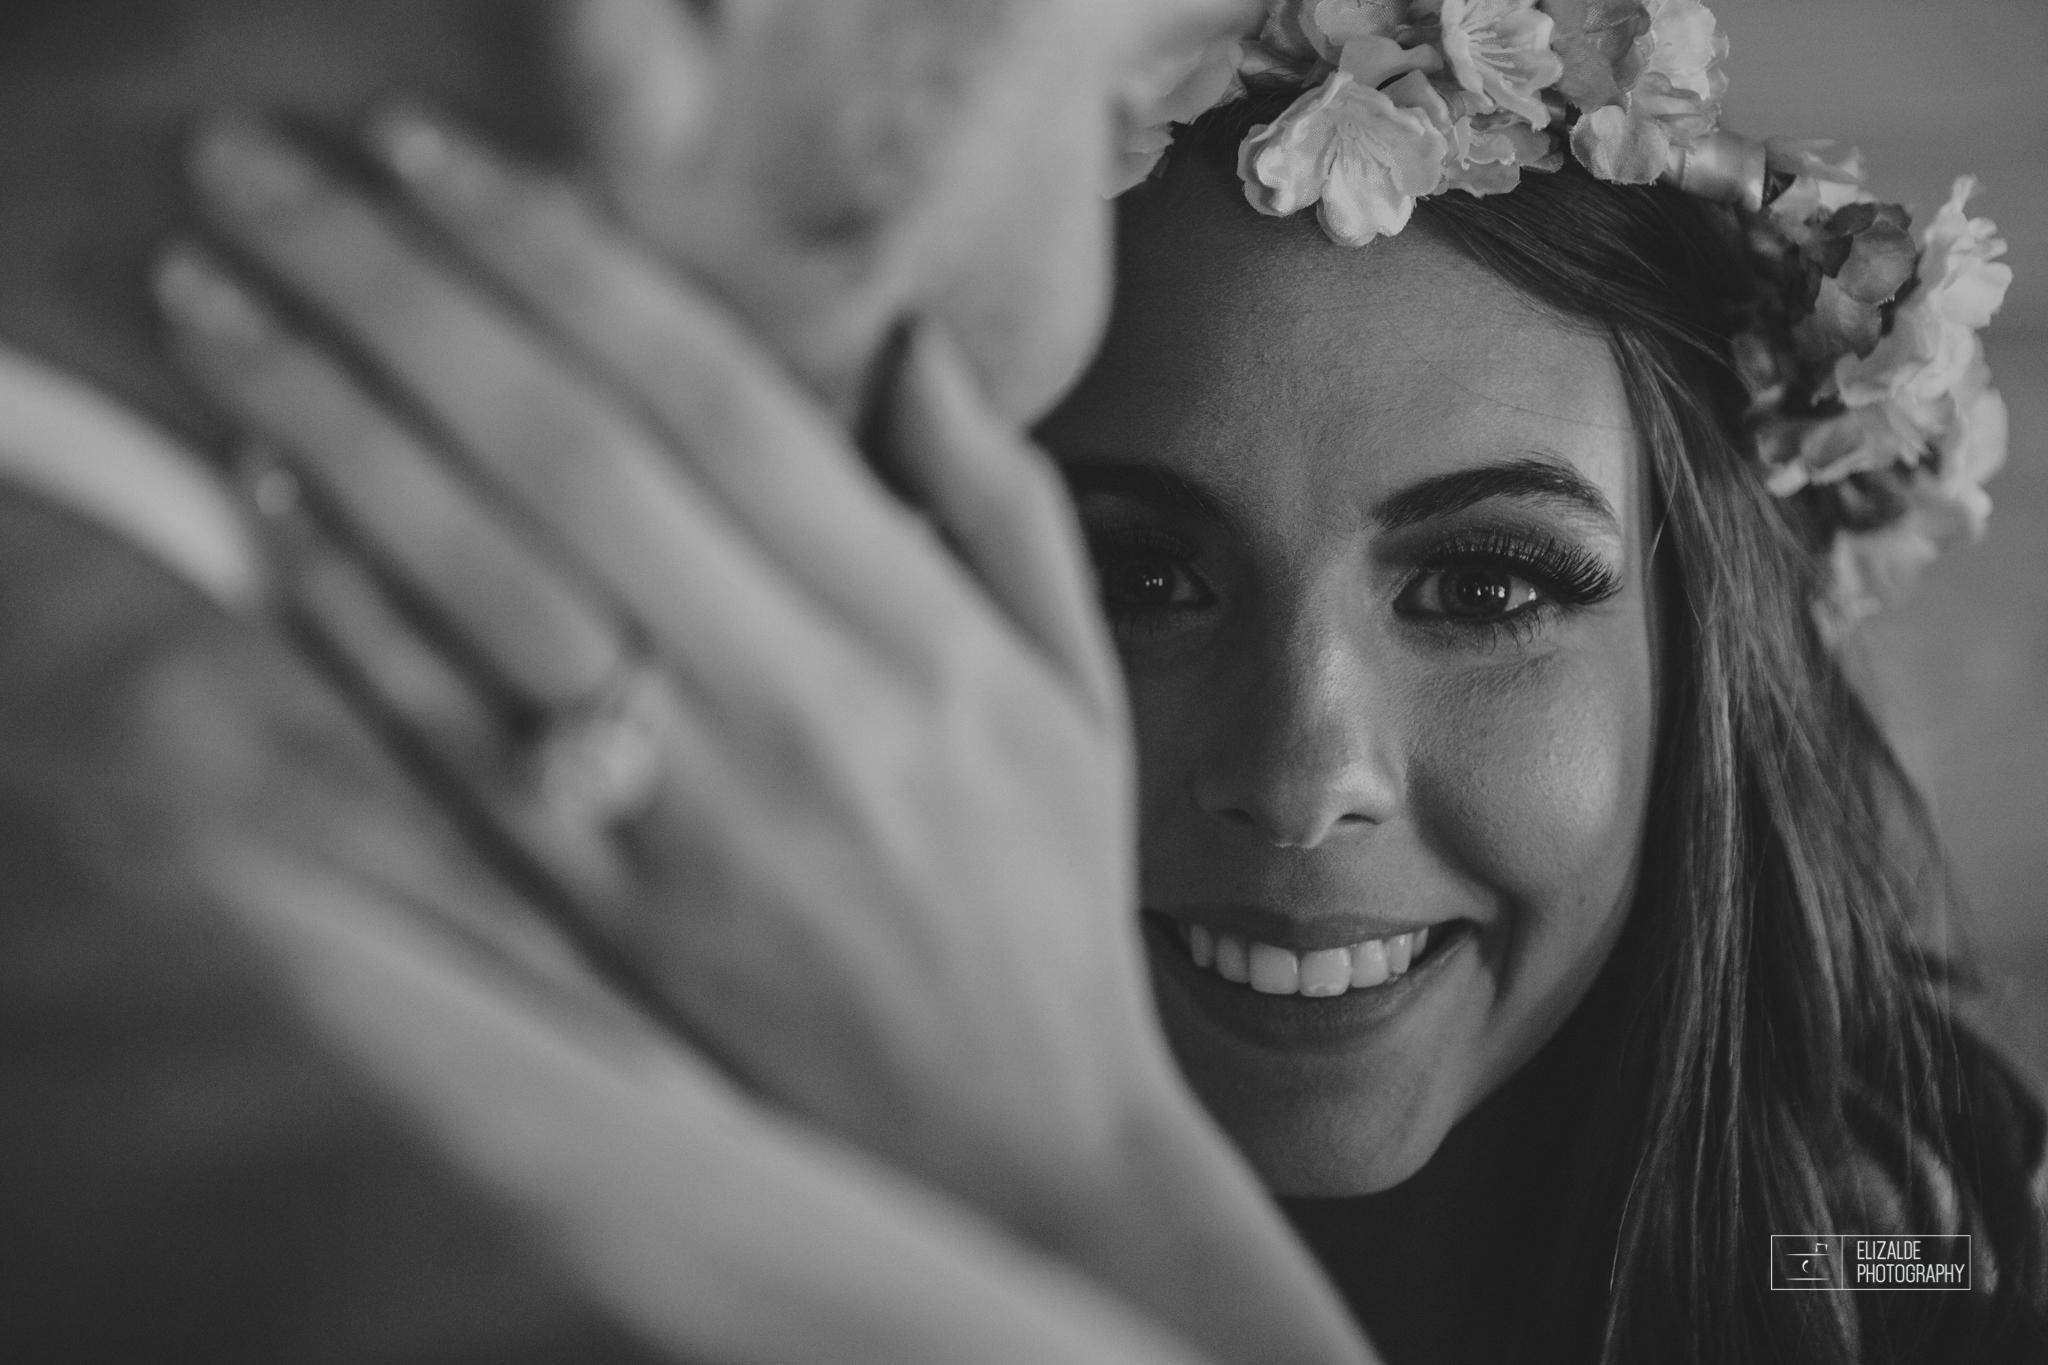 Wedding photographer Dallas_Elizalde Photography_DFW Wedding photographer_ Hickoty Hills_Wedding Photography (54 of 90).jpg